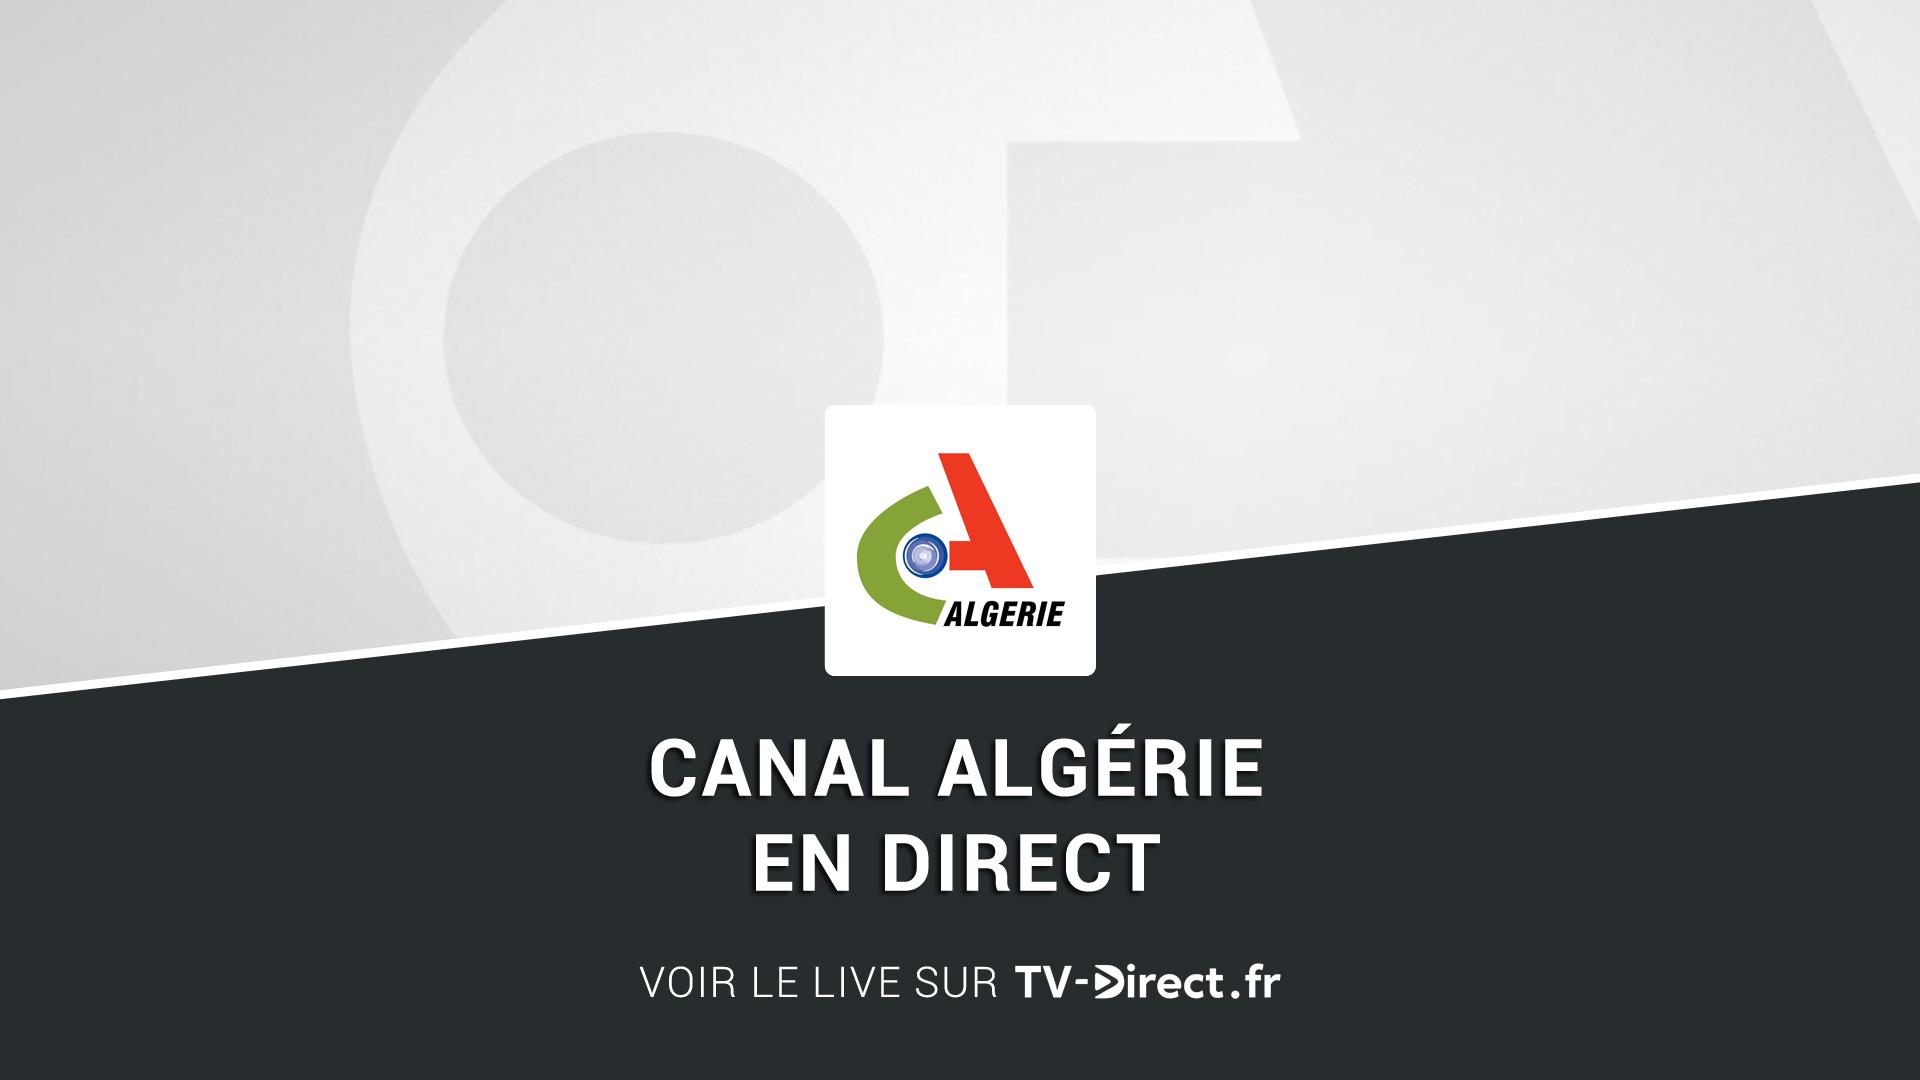 canal alg rie direct regarder canal alg rie en direct live sur internet. Black Bedroom Furniture Sets. Home Design Ideas